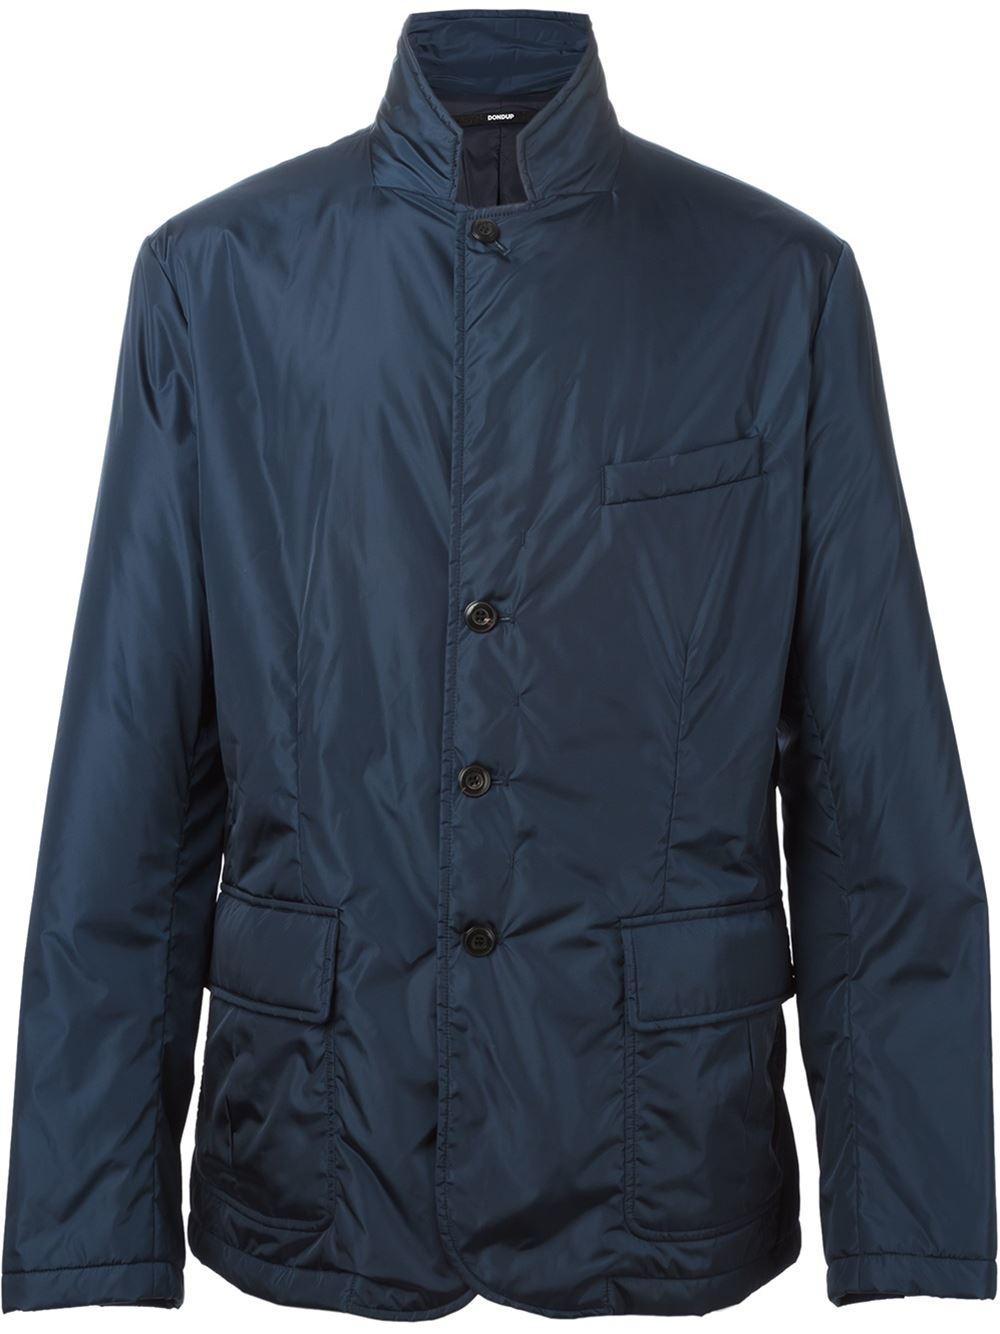 Dondup Windbreaker-style Jacket in Blue for Men - Save 60% ...